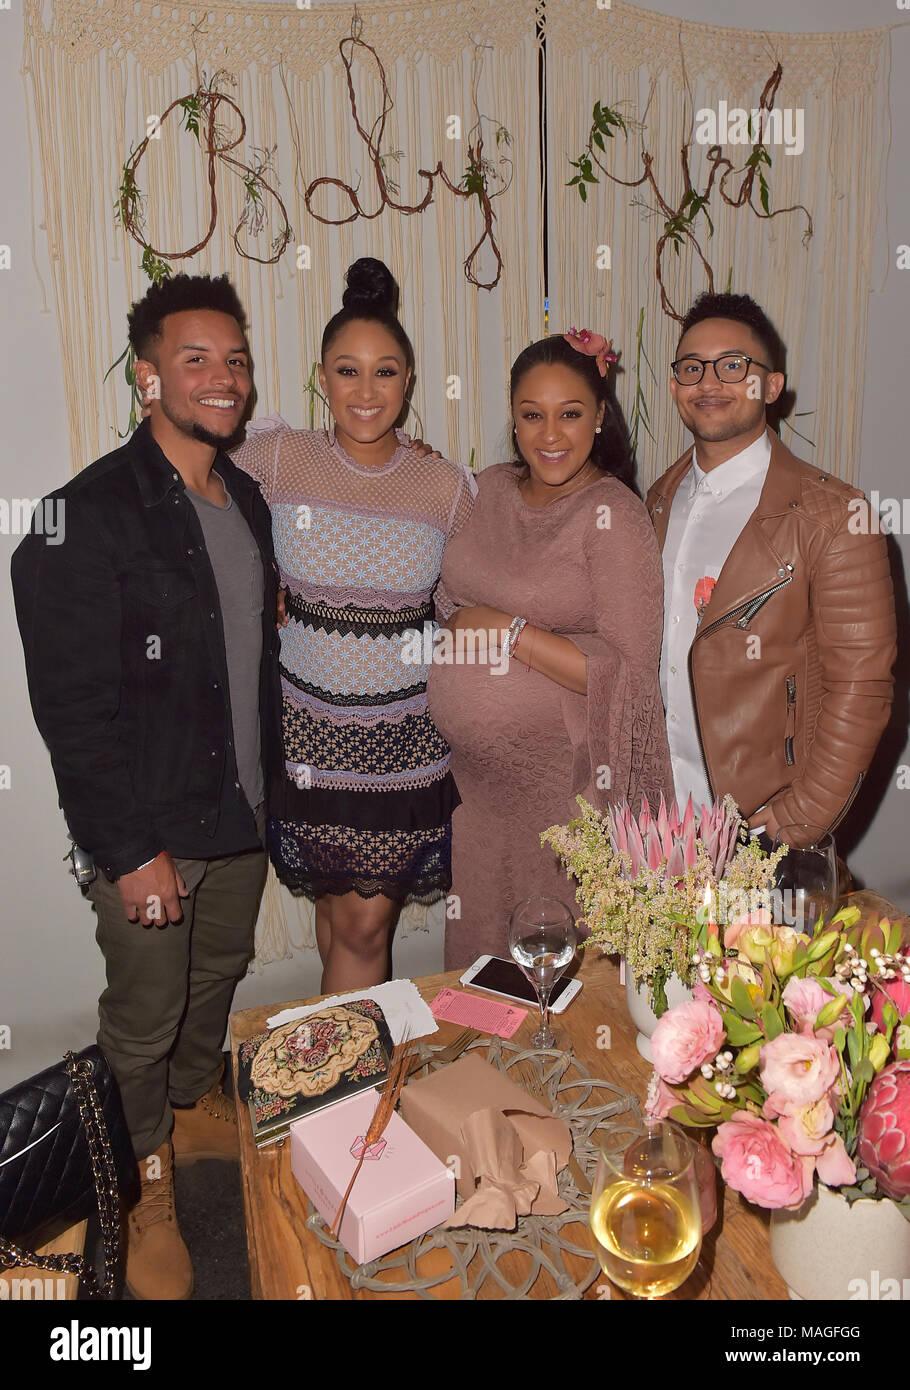 Beverly Hills Ca 31st Mar 2018 Tamera Mowry Tia Mowry Tahj